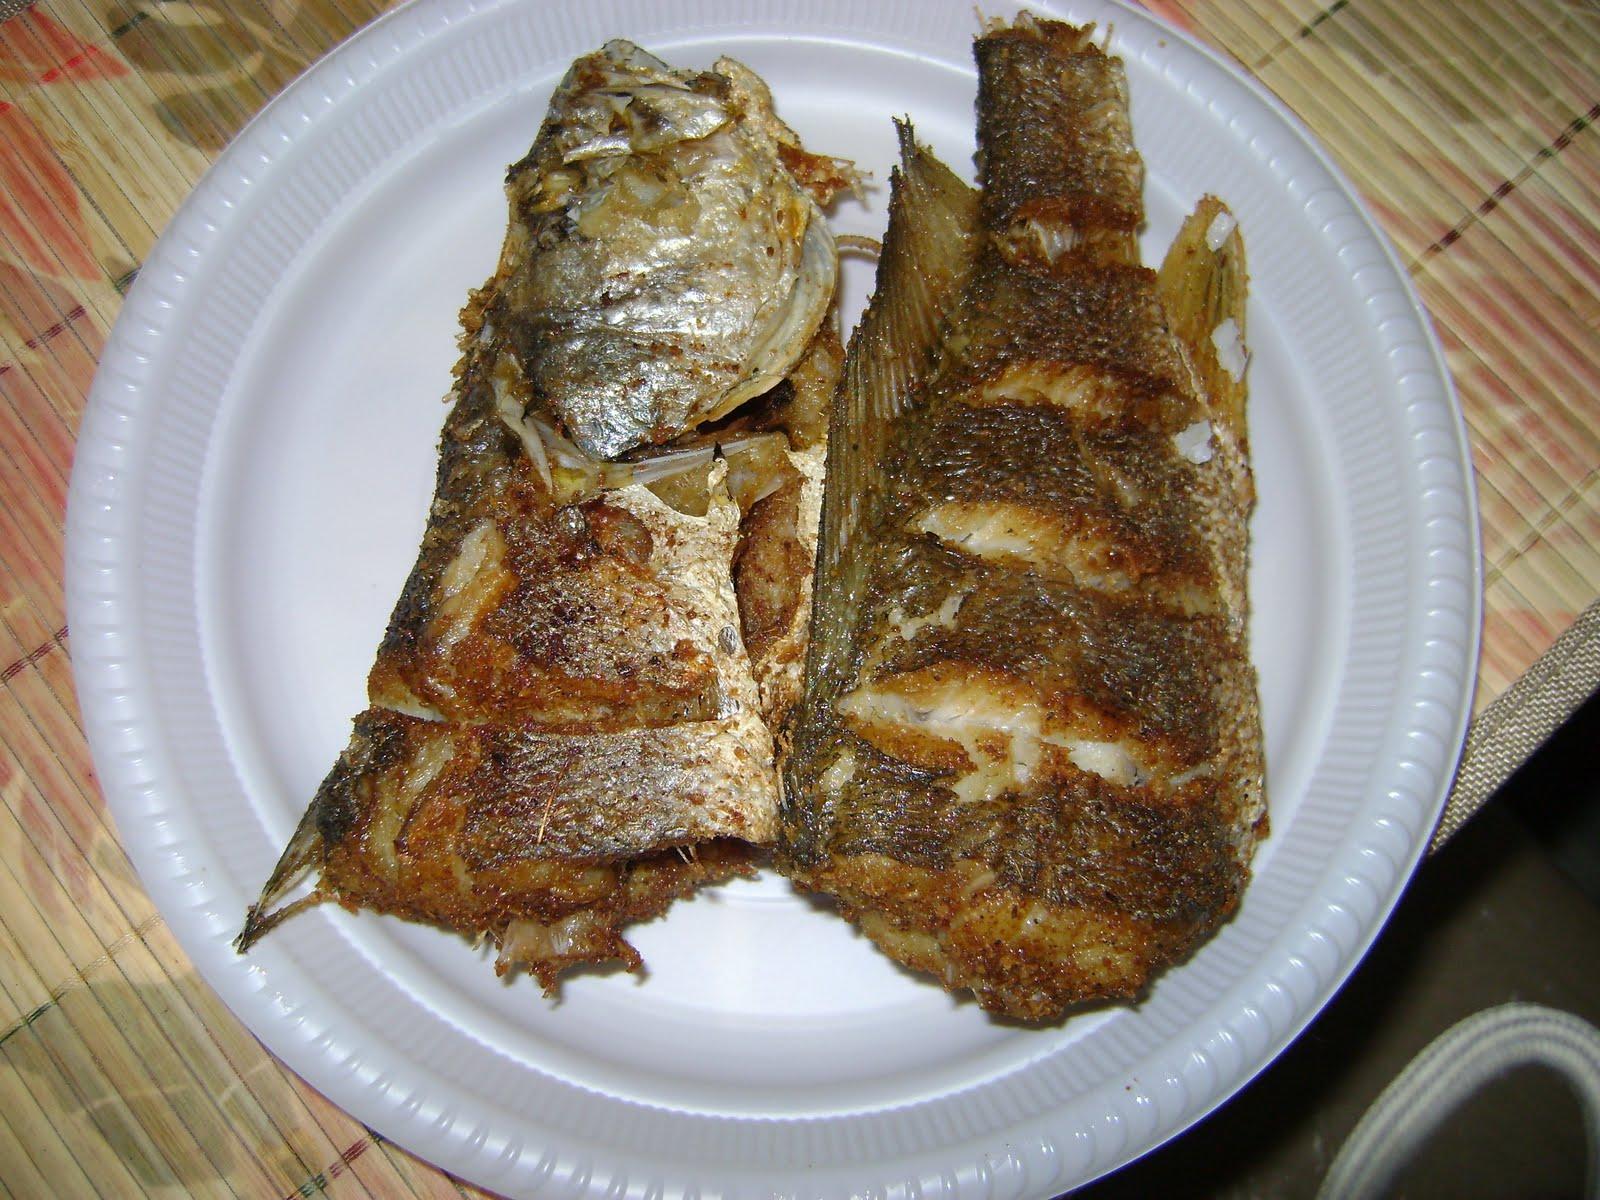 Victoria yoro honduras platos tipicos veraniegos for Platos de semana santa